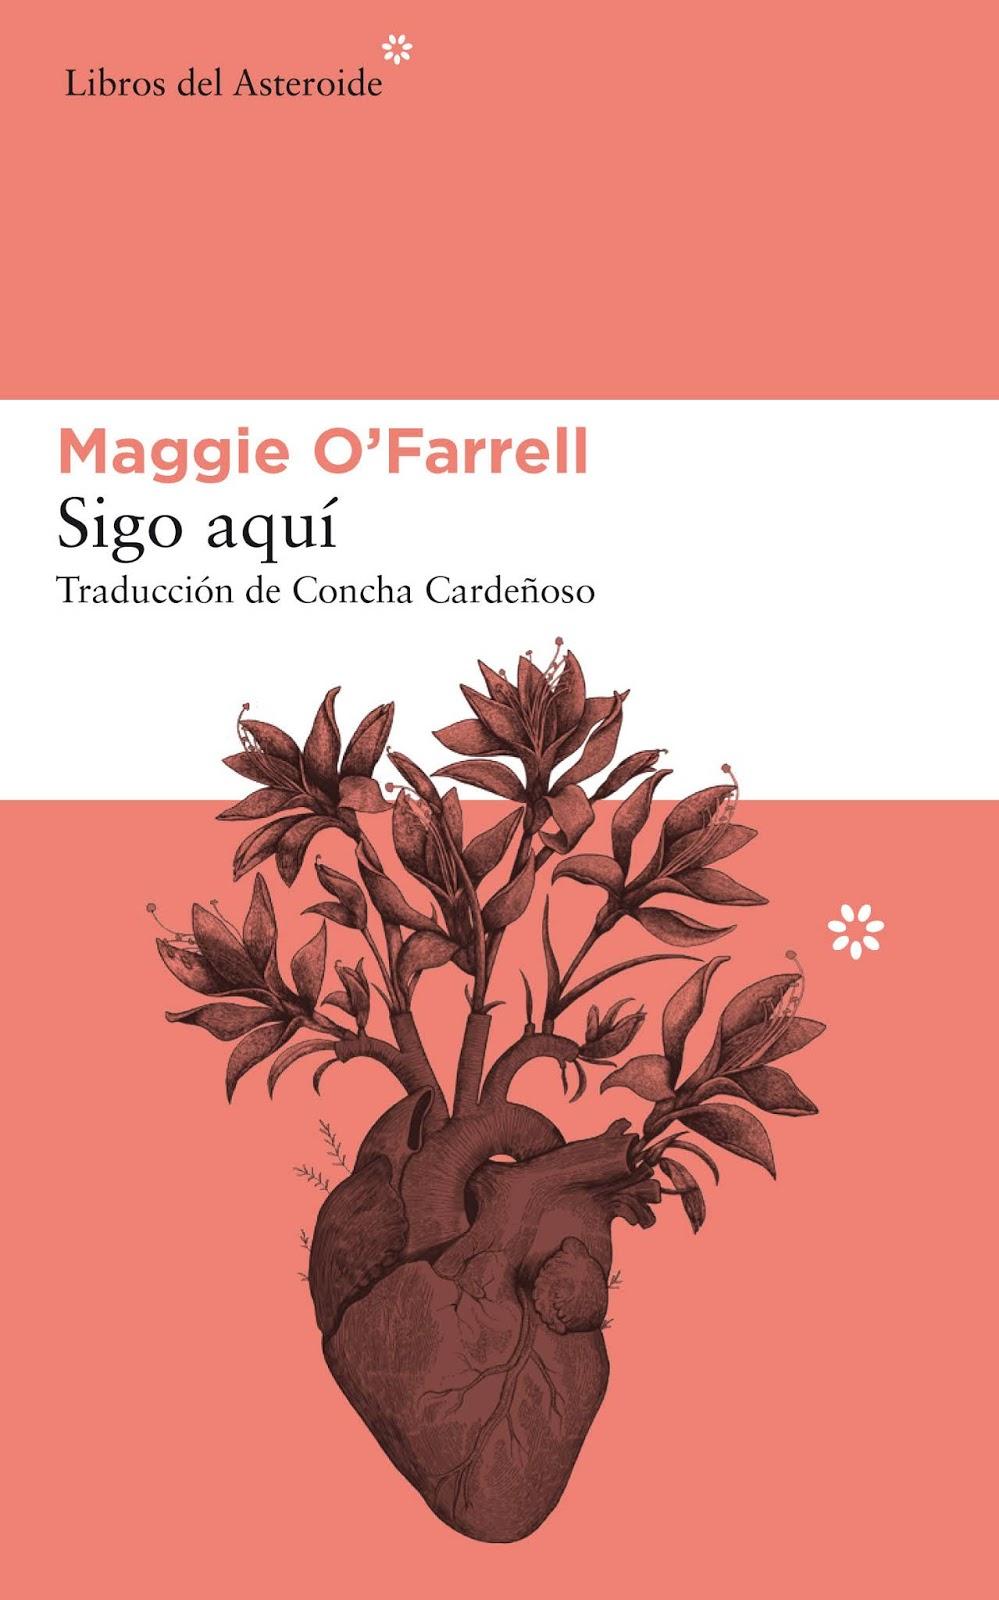 http://laantiguabiblos.blogspot.com/2019/04/sigo-aqui-maggie-ofarrell.html